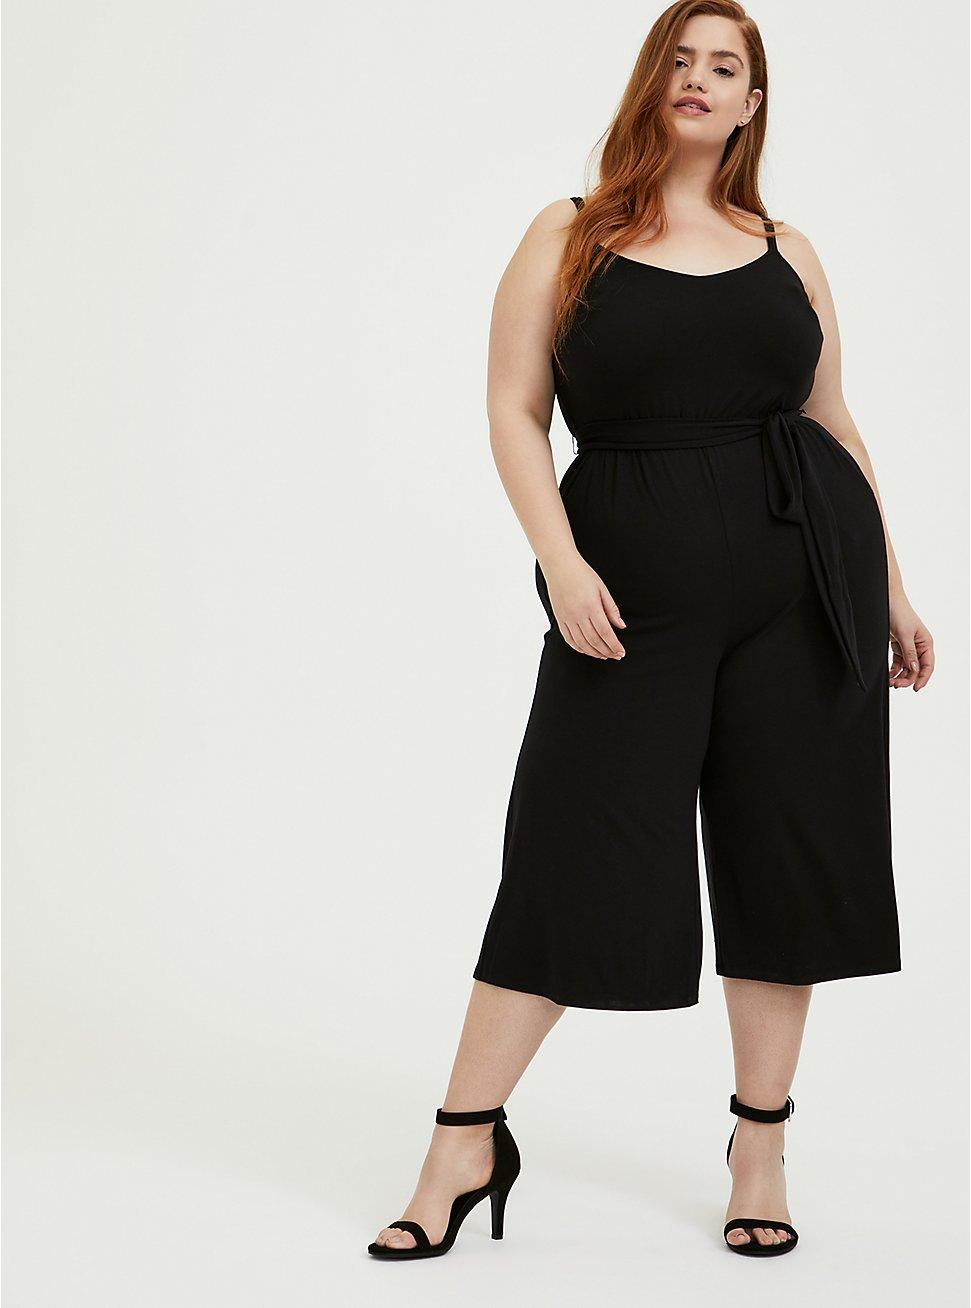 Super Soft Black  Self Tie Culotte Jumpsuit, DEEP BLACK, hi-res